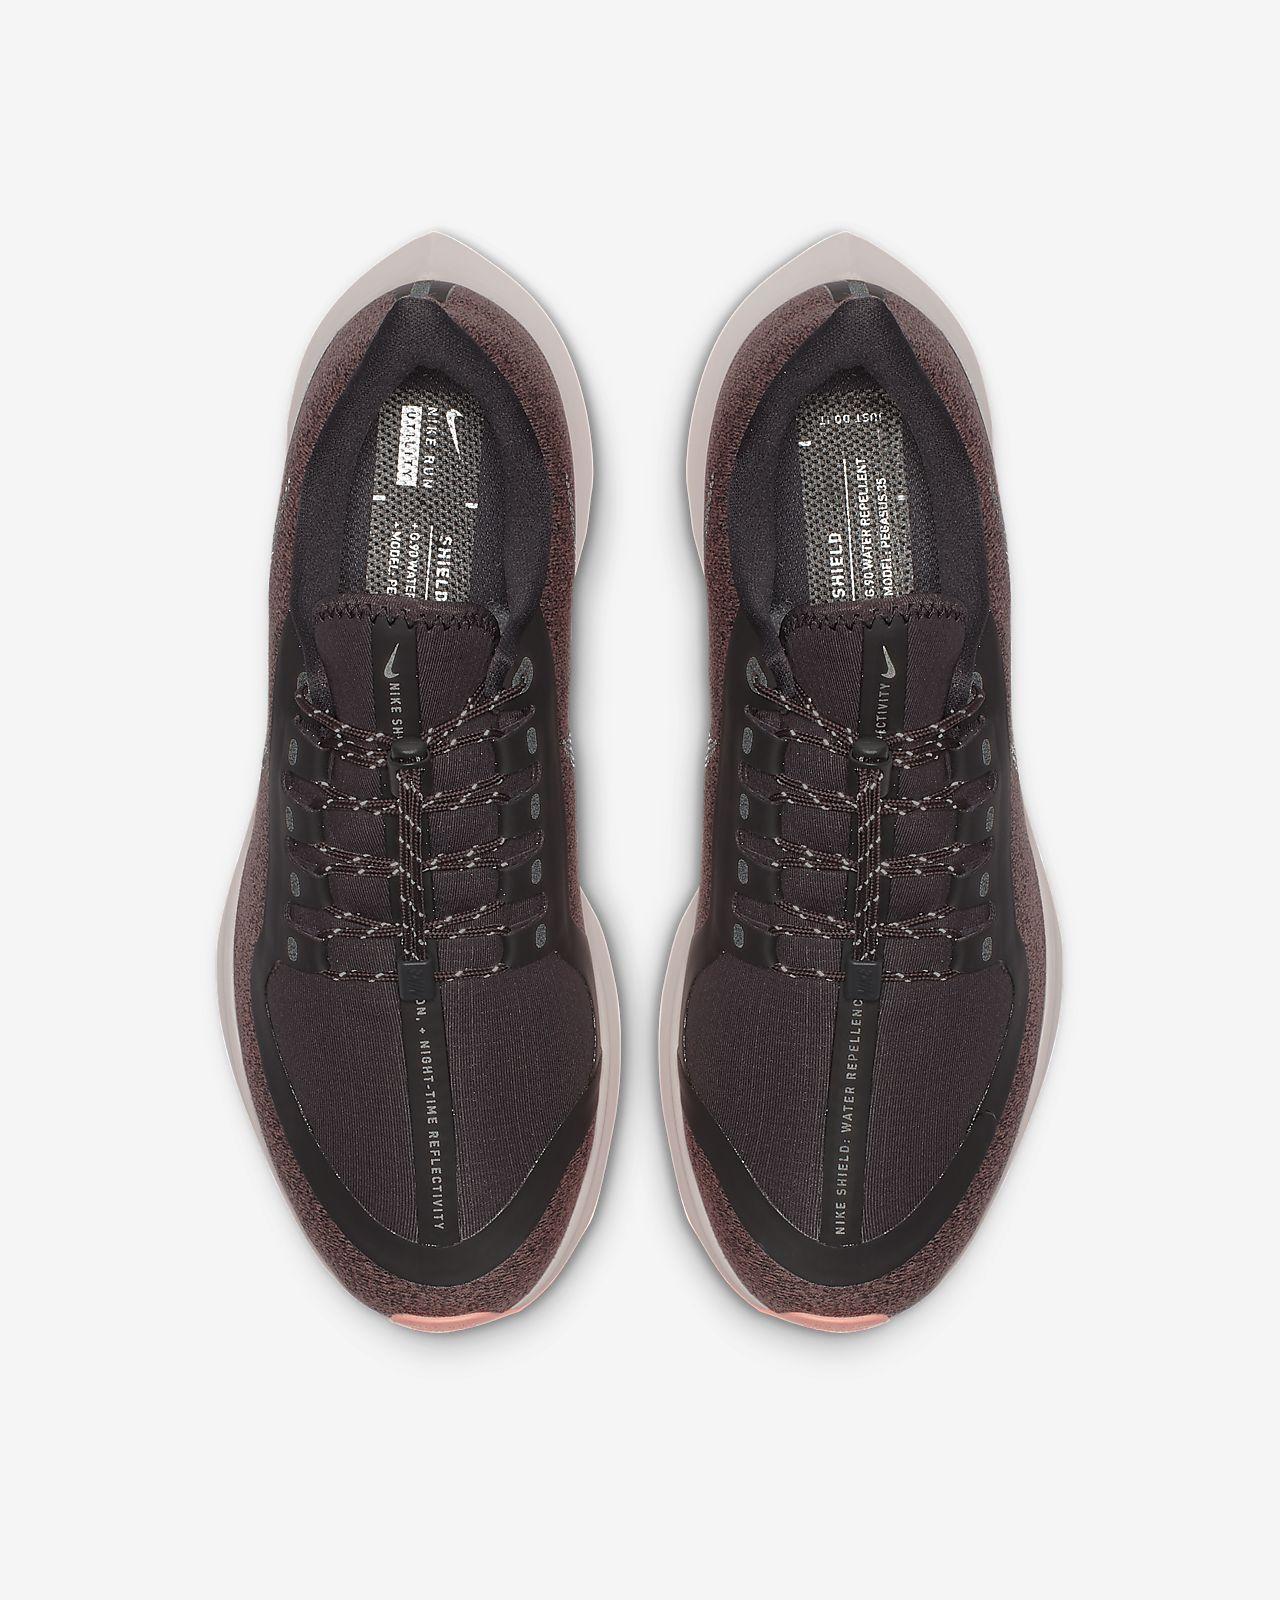 cf4a143f3 ... Sapatilhas de running Nike Air Zoom Pegasus 35 Shield Water-Repellent  para mulher